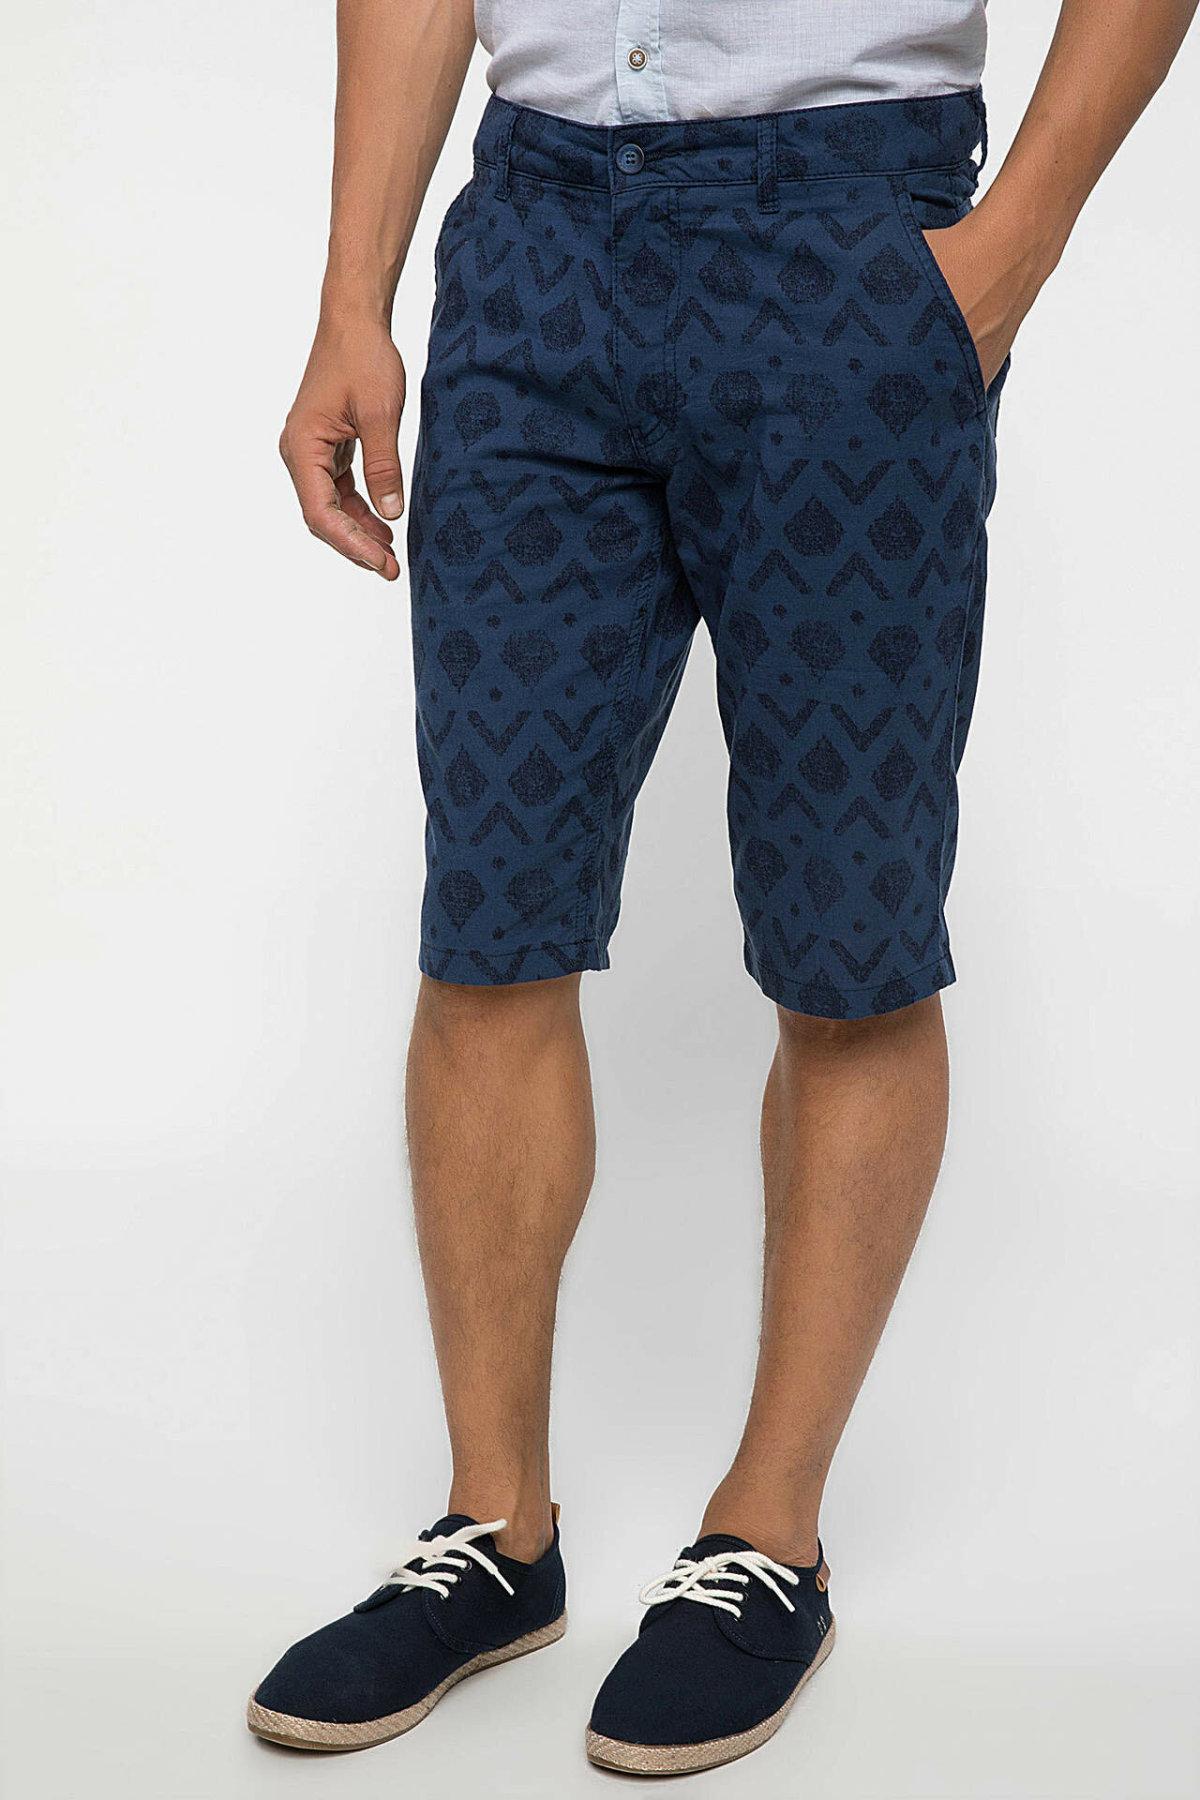 DeFacto Man Summer Casual Shorts Men Fashion Prints Short Male Navy Blue Bermuda Mid-waist Shorts-I8225AZ18SM